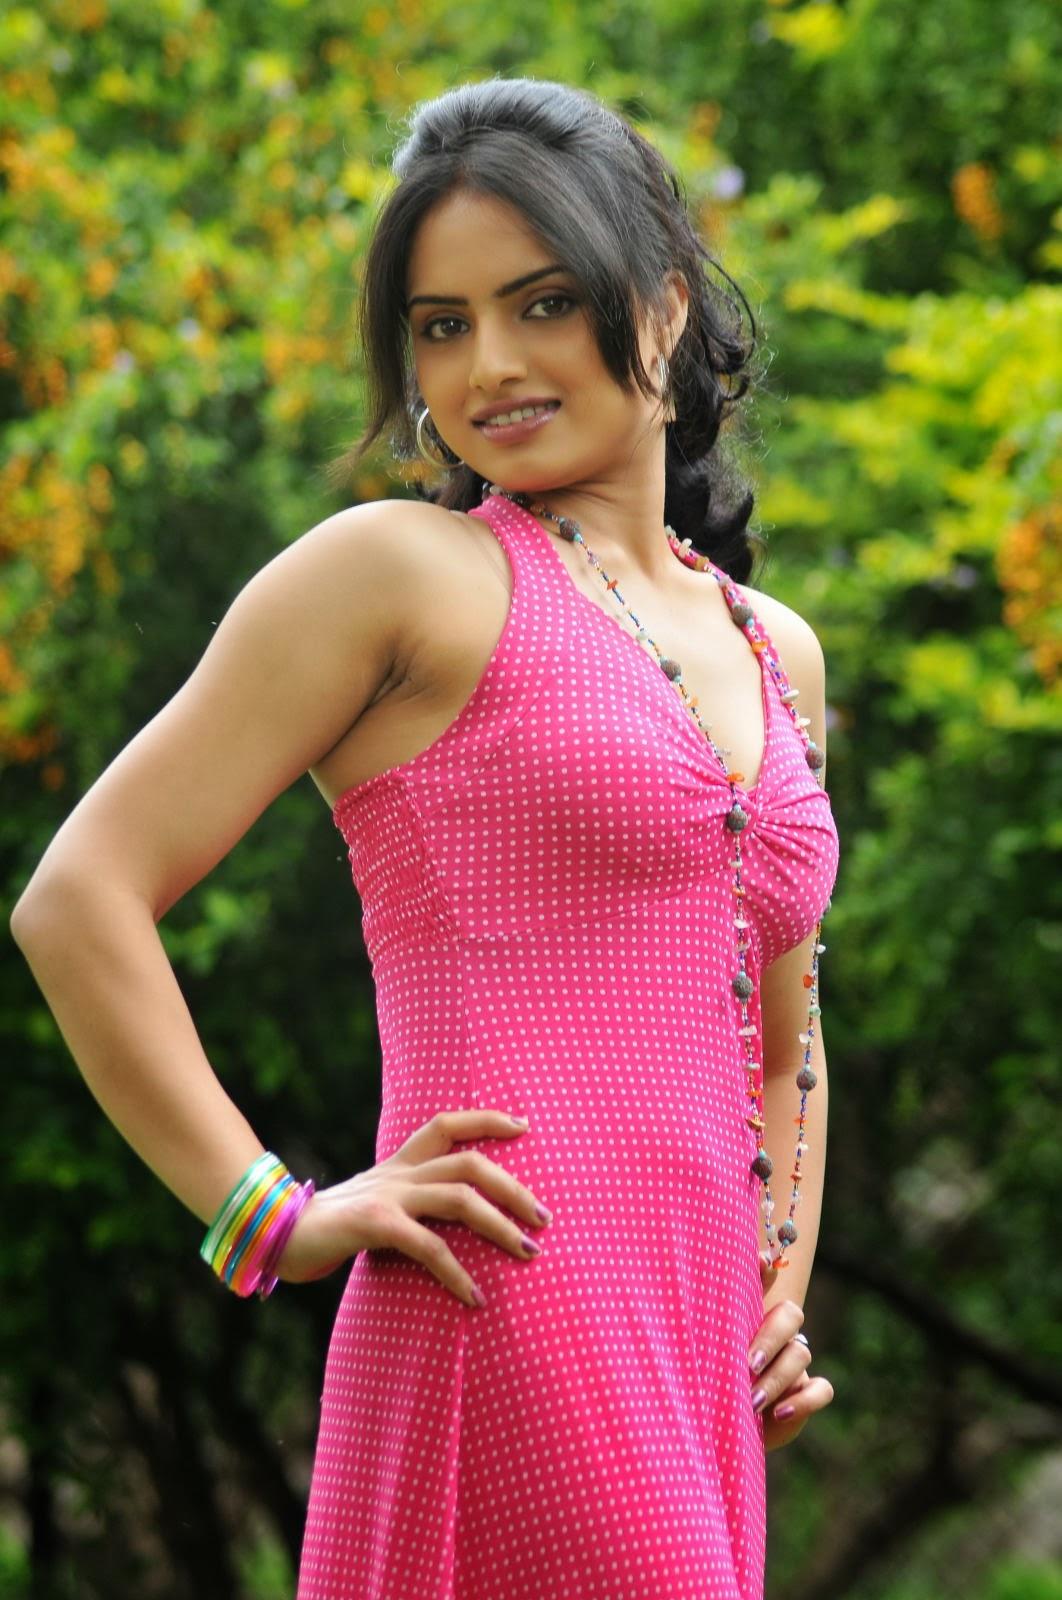 Ritu kaur latest hot photo gallery in pink long dress